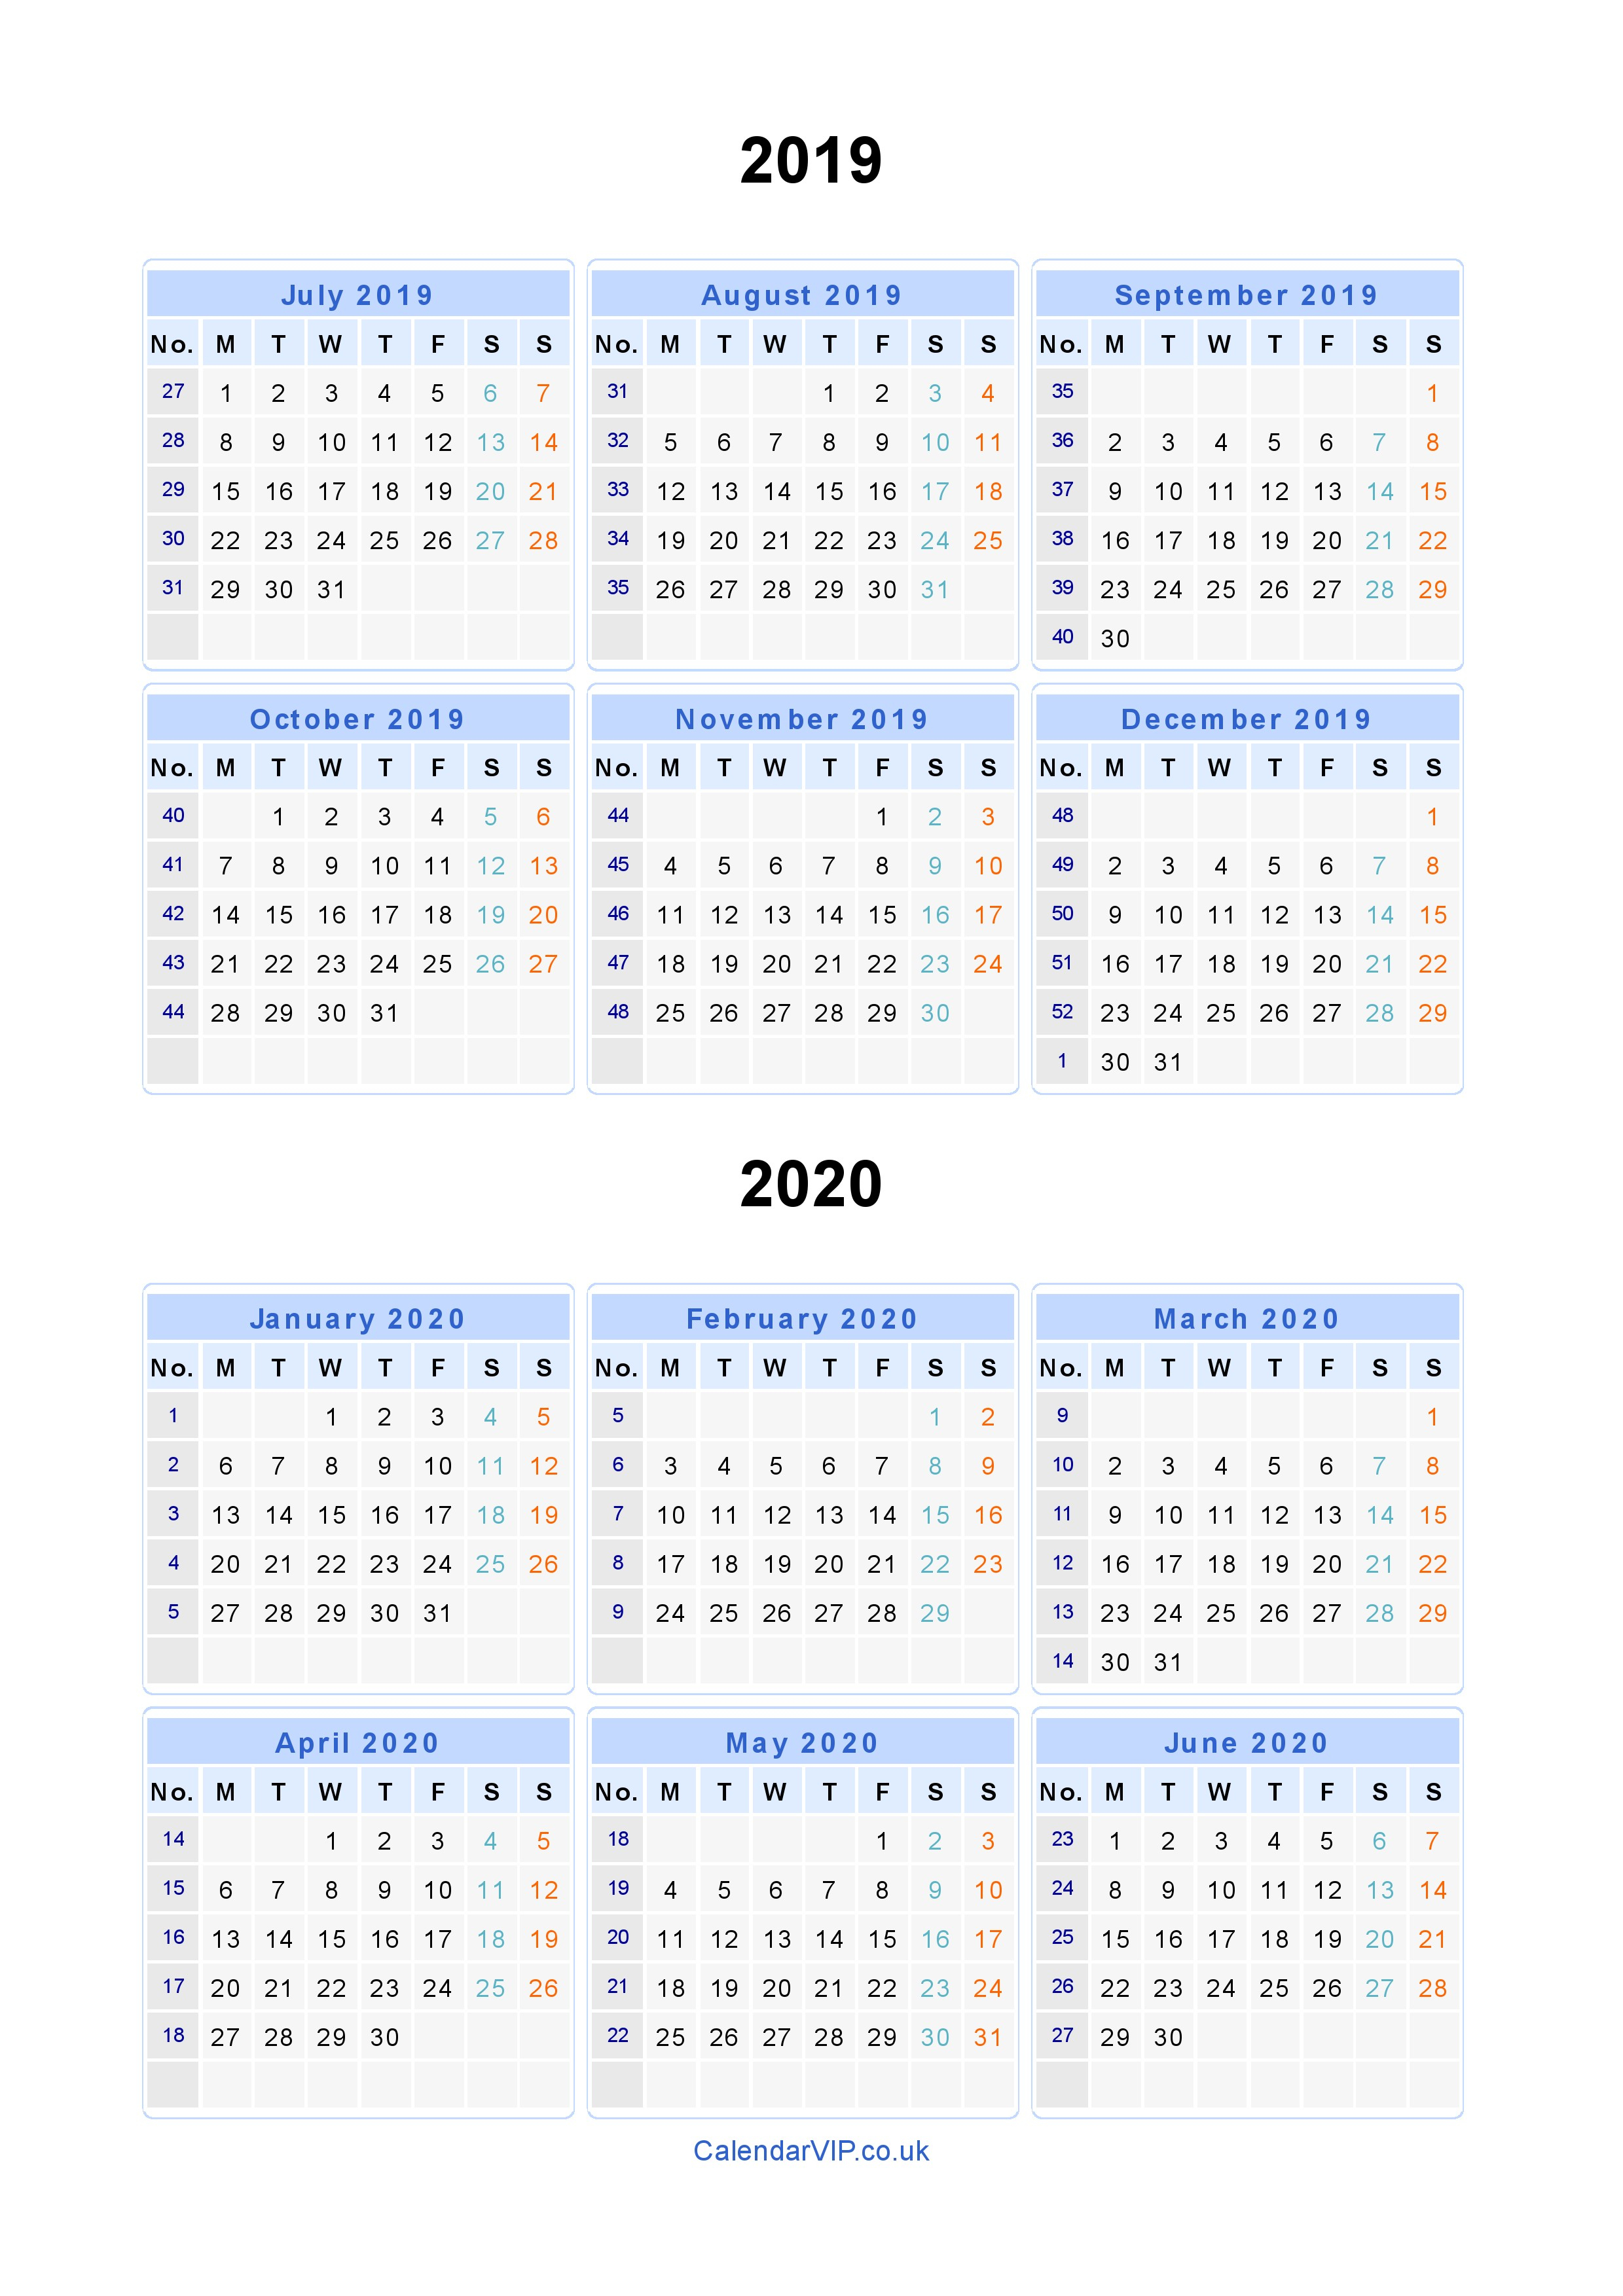 Split Year Calendars 2019 2020 - Calendar From July 2019 To June 2020 with regard to 2019-2020 Calendar Financial Week Numbers